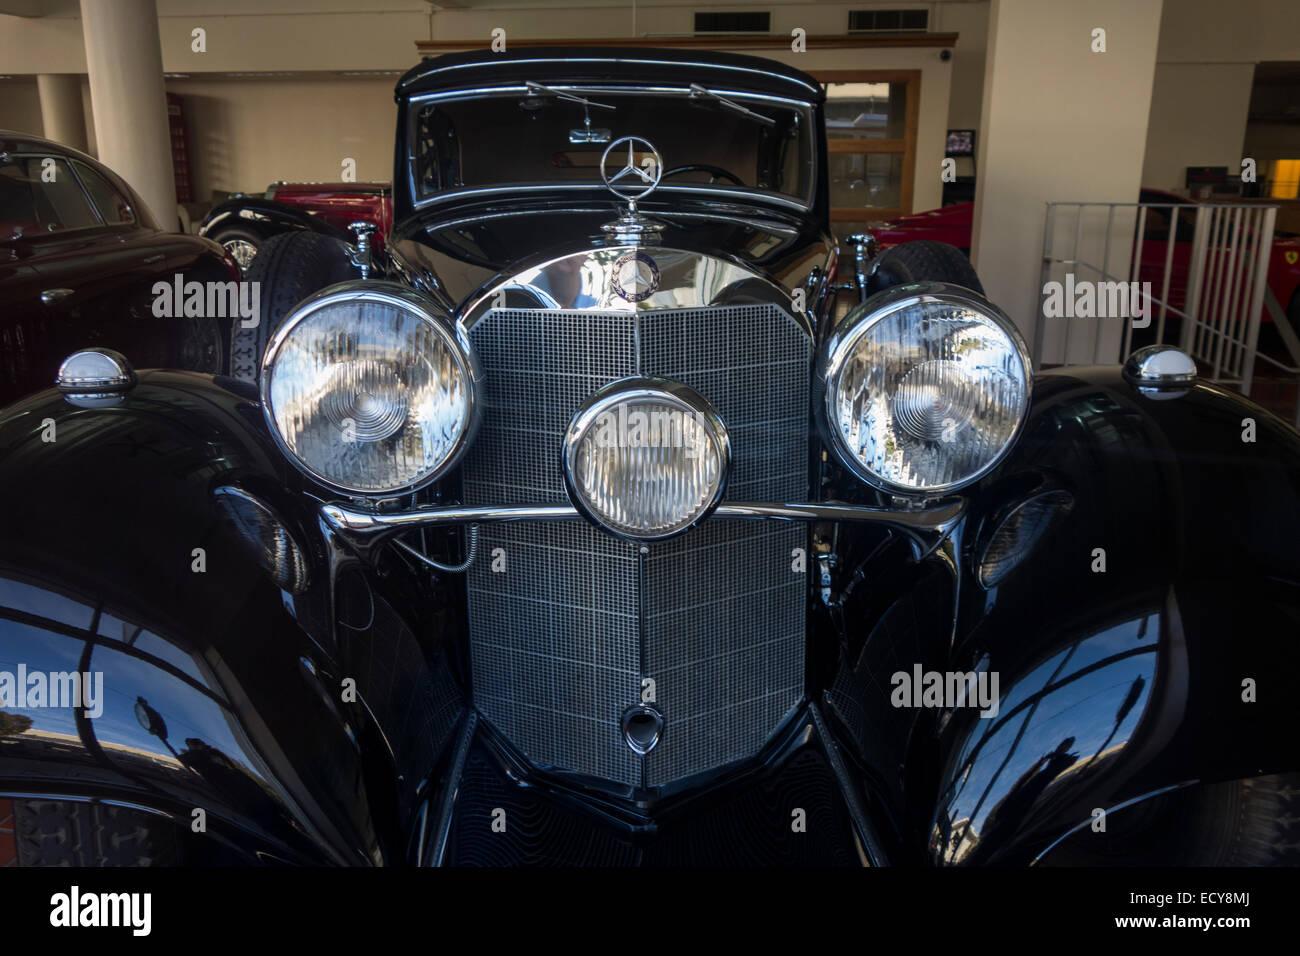 antique car dealership in San Francisco CA Stock Photo, Royalty Free ...